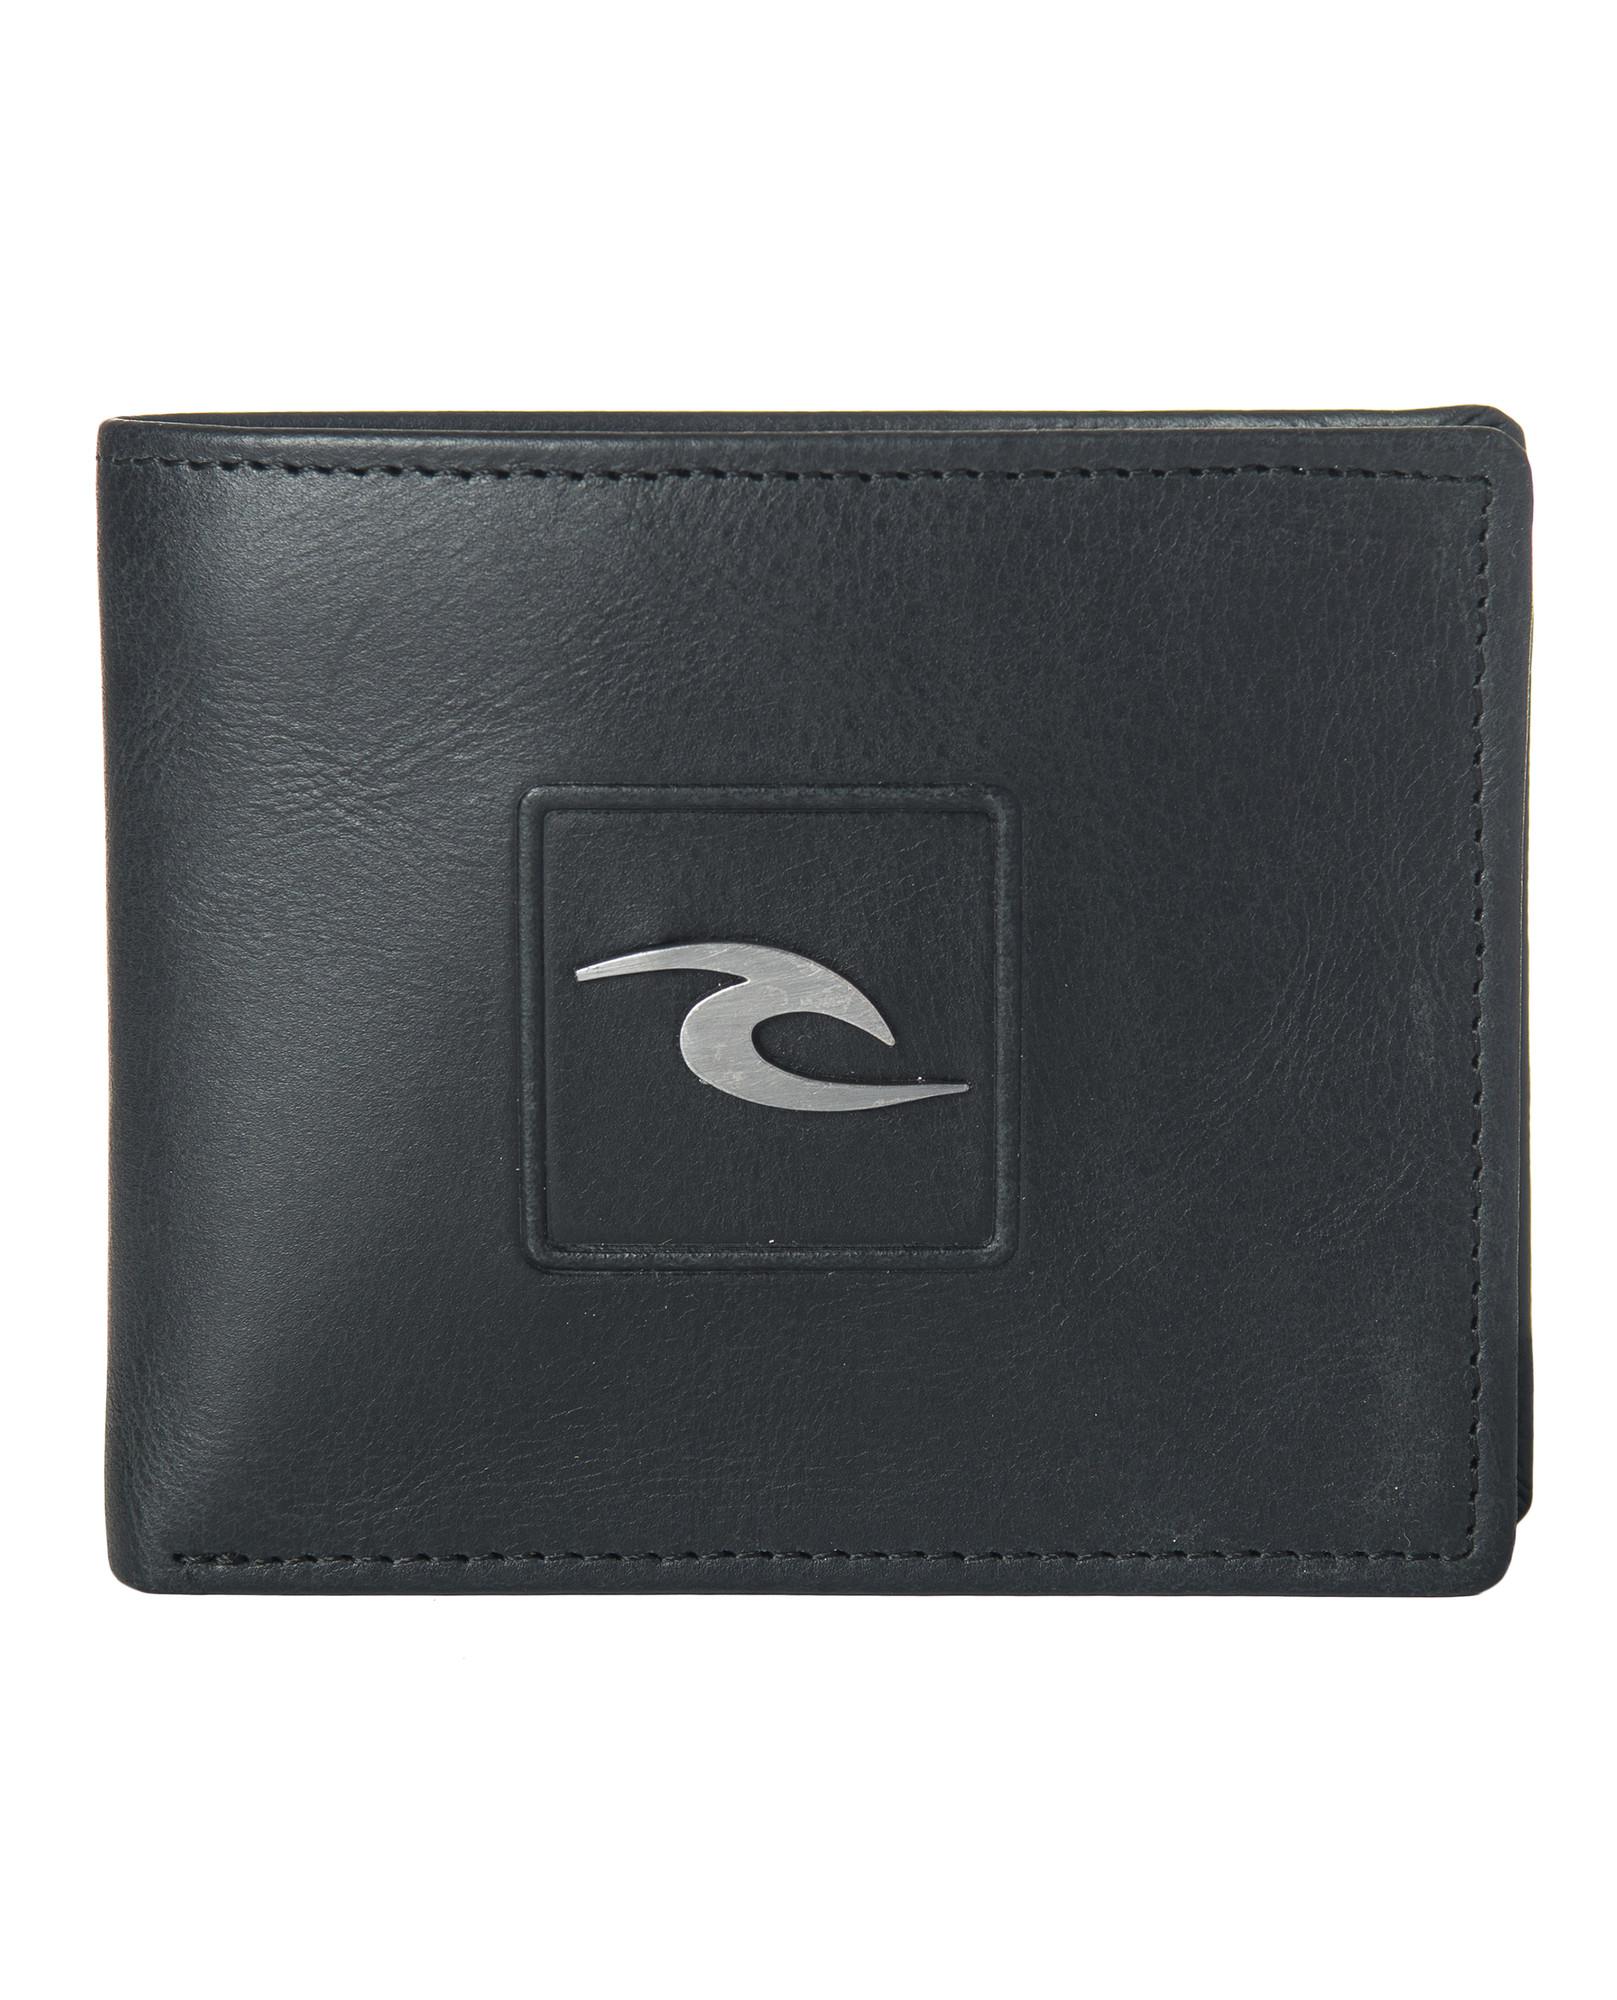 Peněženka pánská RIP CURL RIDER RFID 2 IN 1